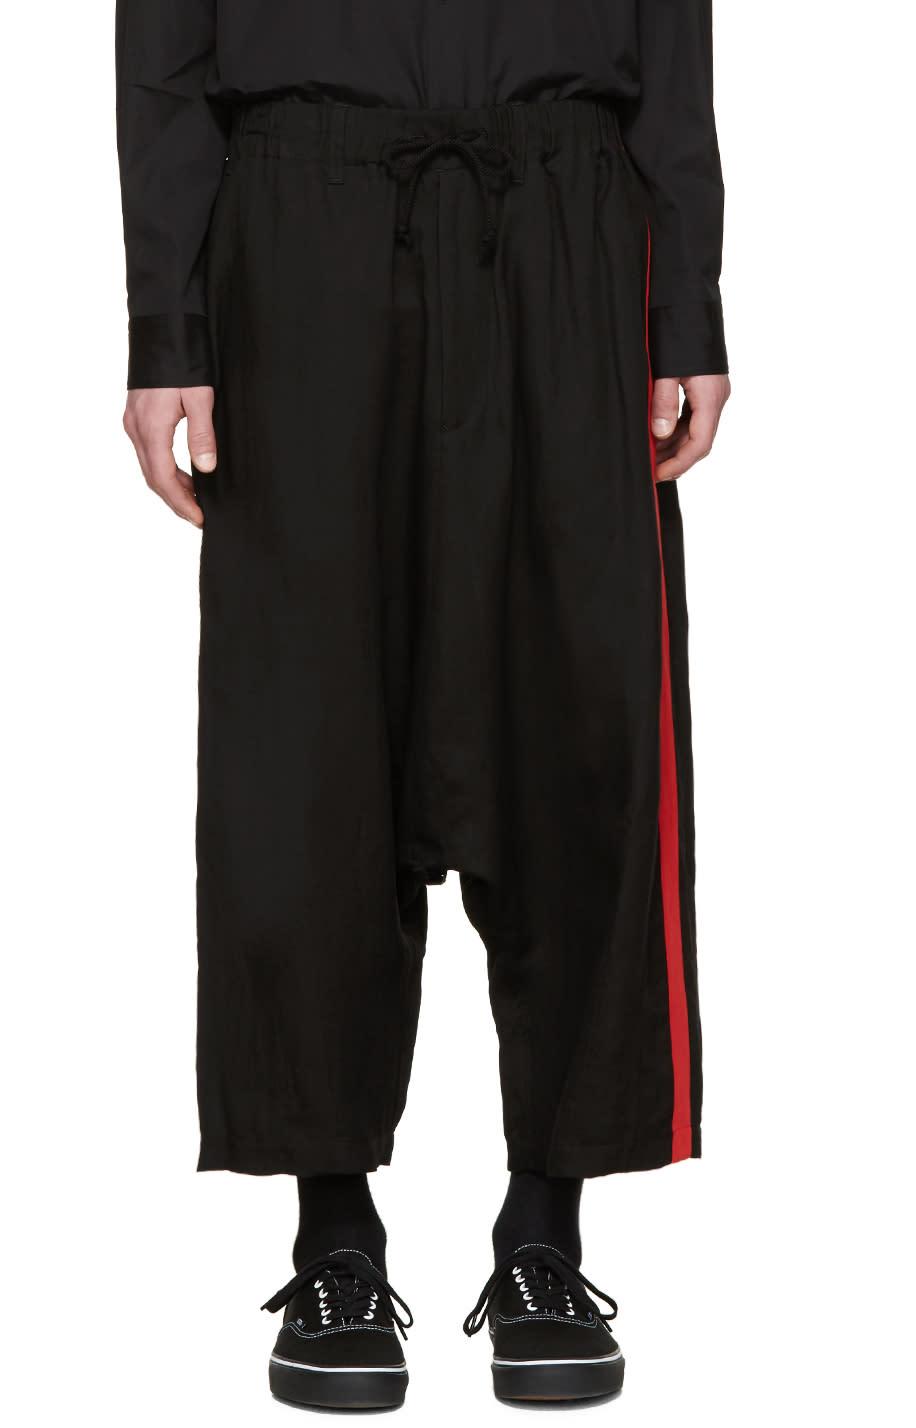 Yohji Yamamoto Black Striped Sarouel Trousers